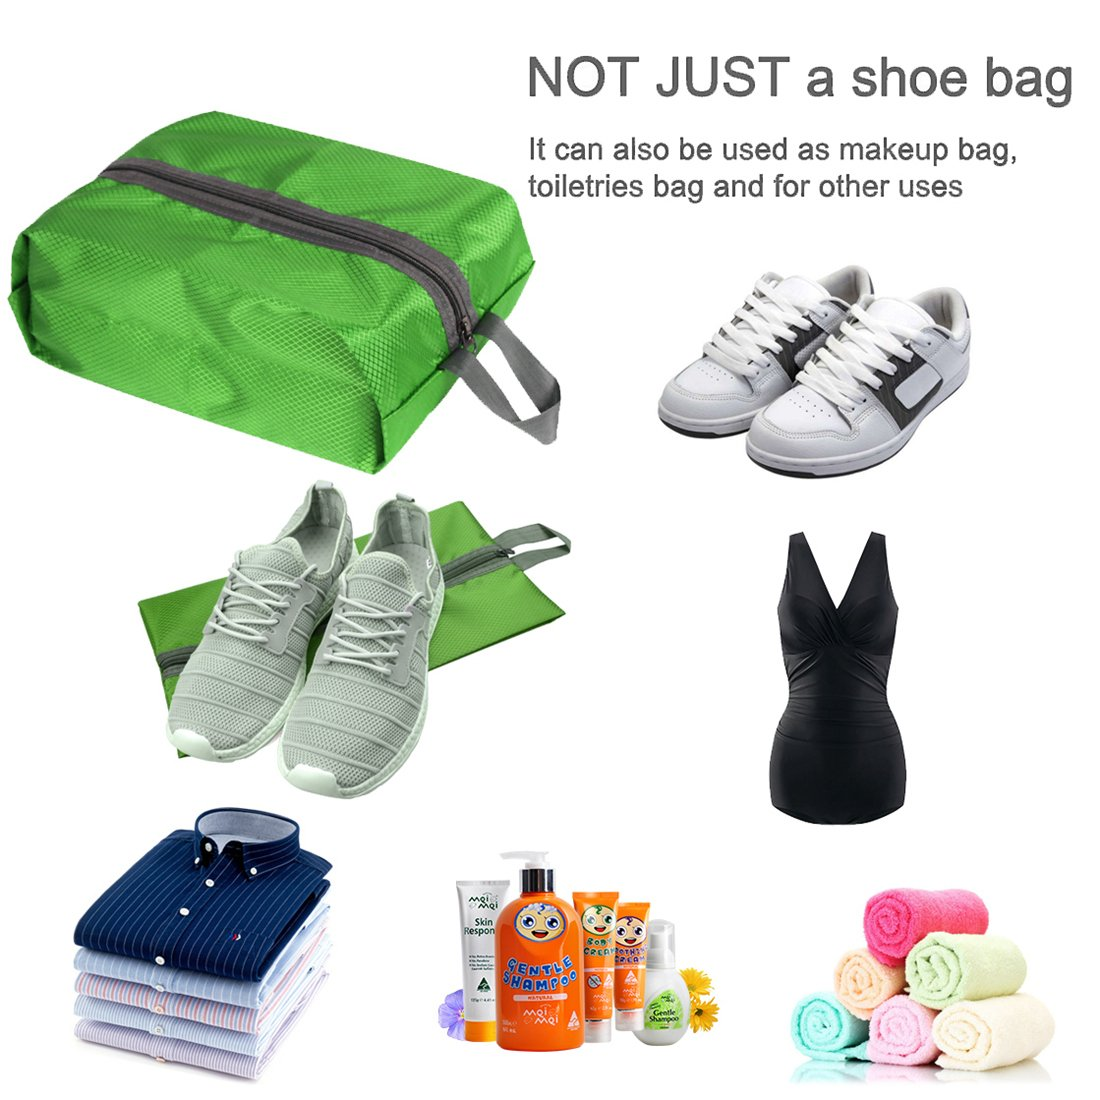 Neobang Portable Nylon Travel Shoe Bags Set of 4 with Zipper Closure for Men Women